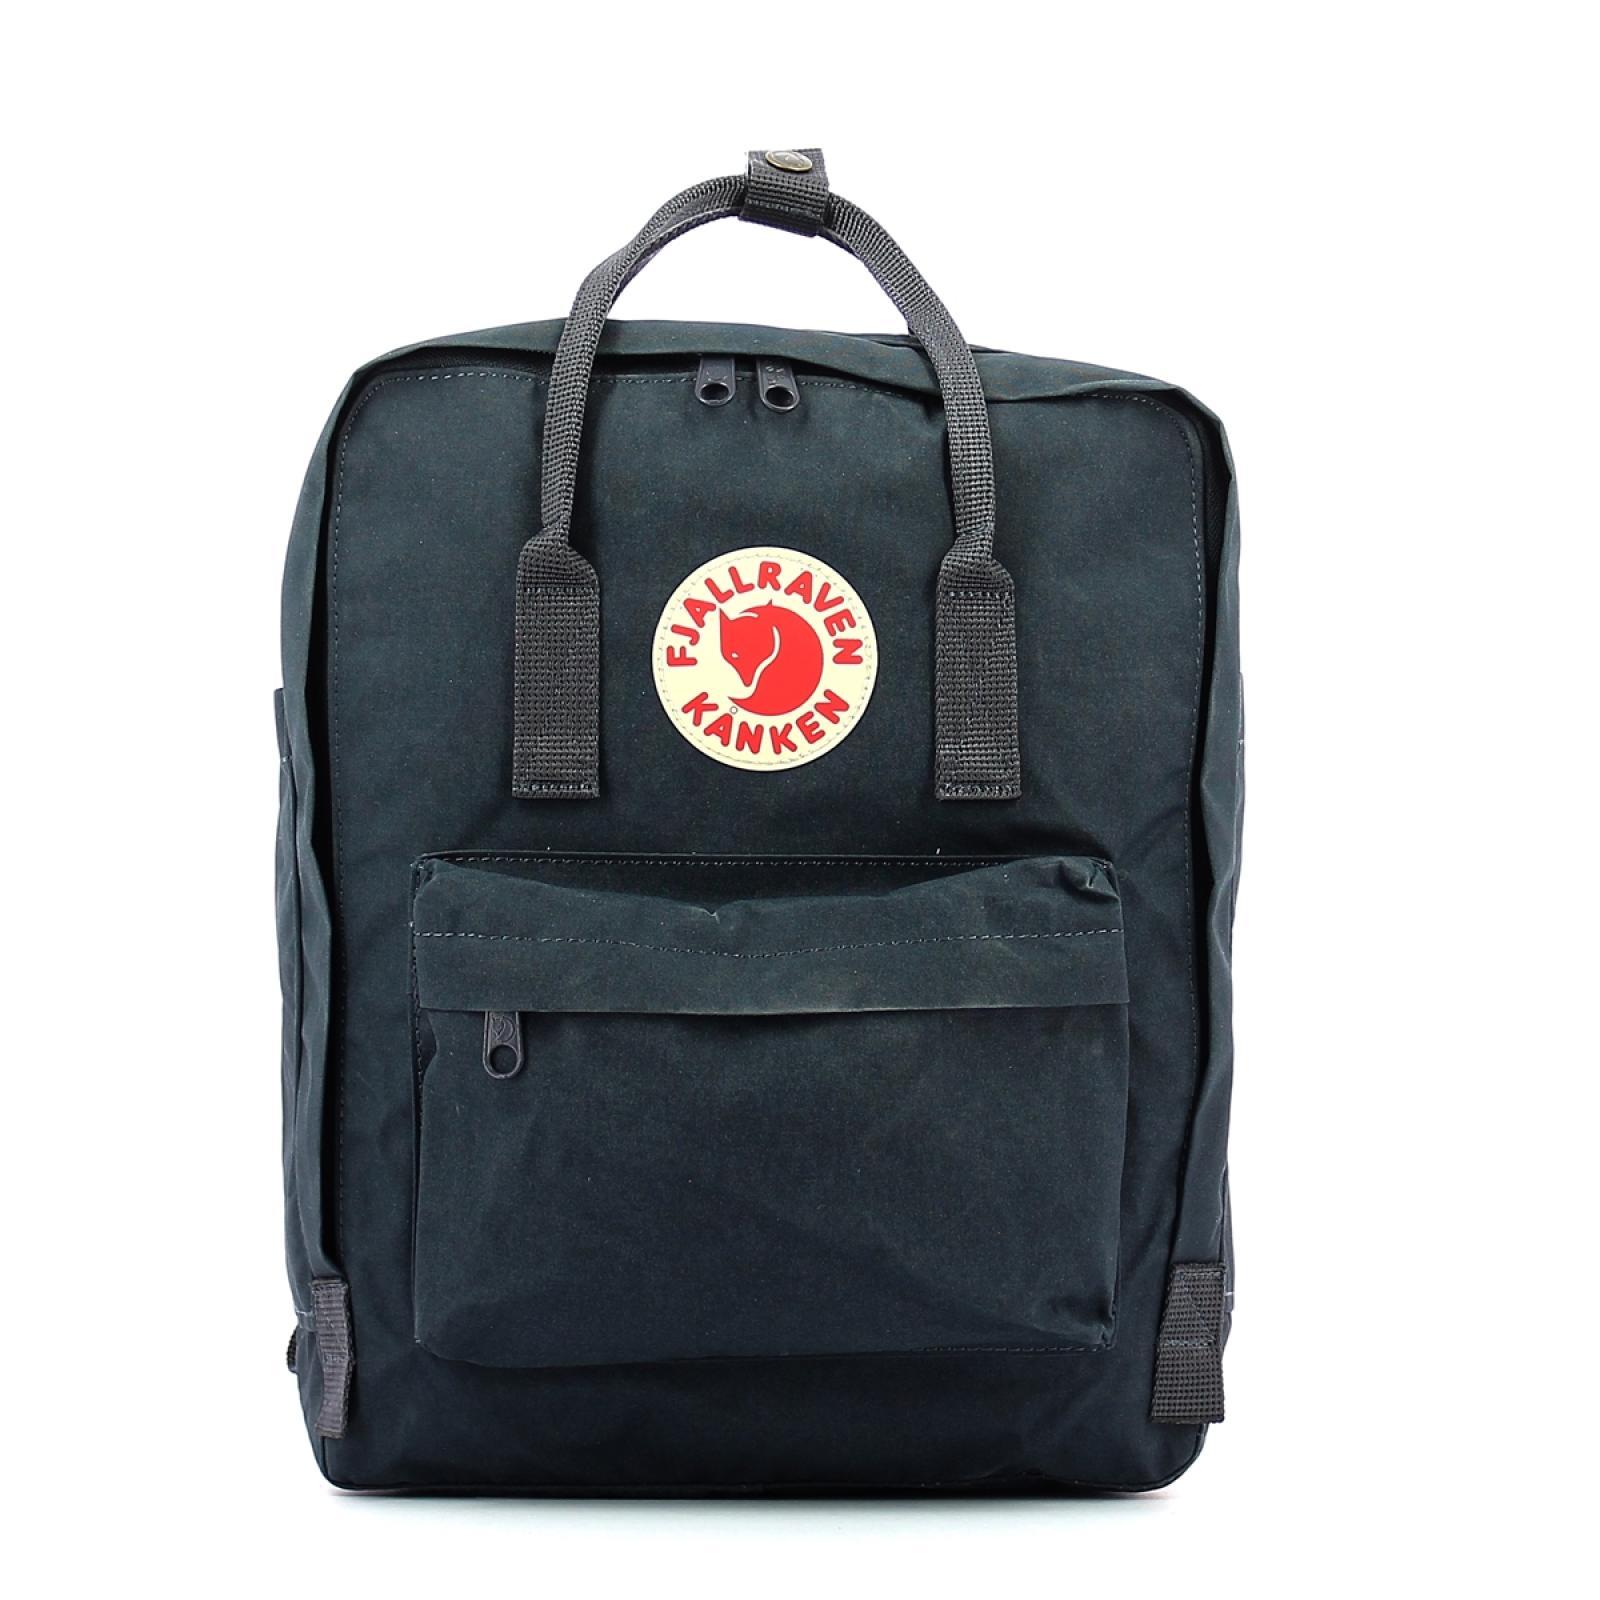 Backpack Kånken-NAVY-UN